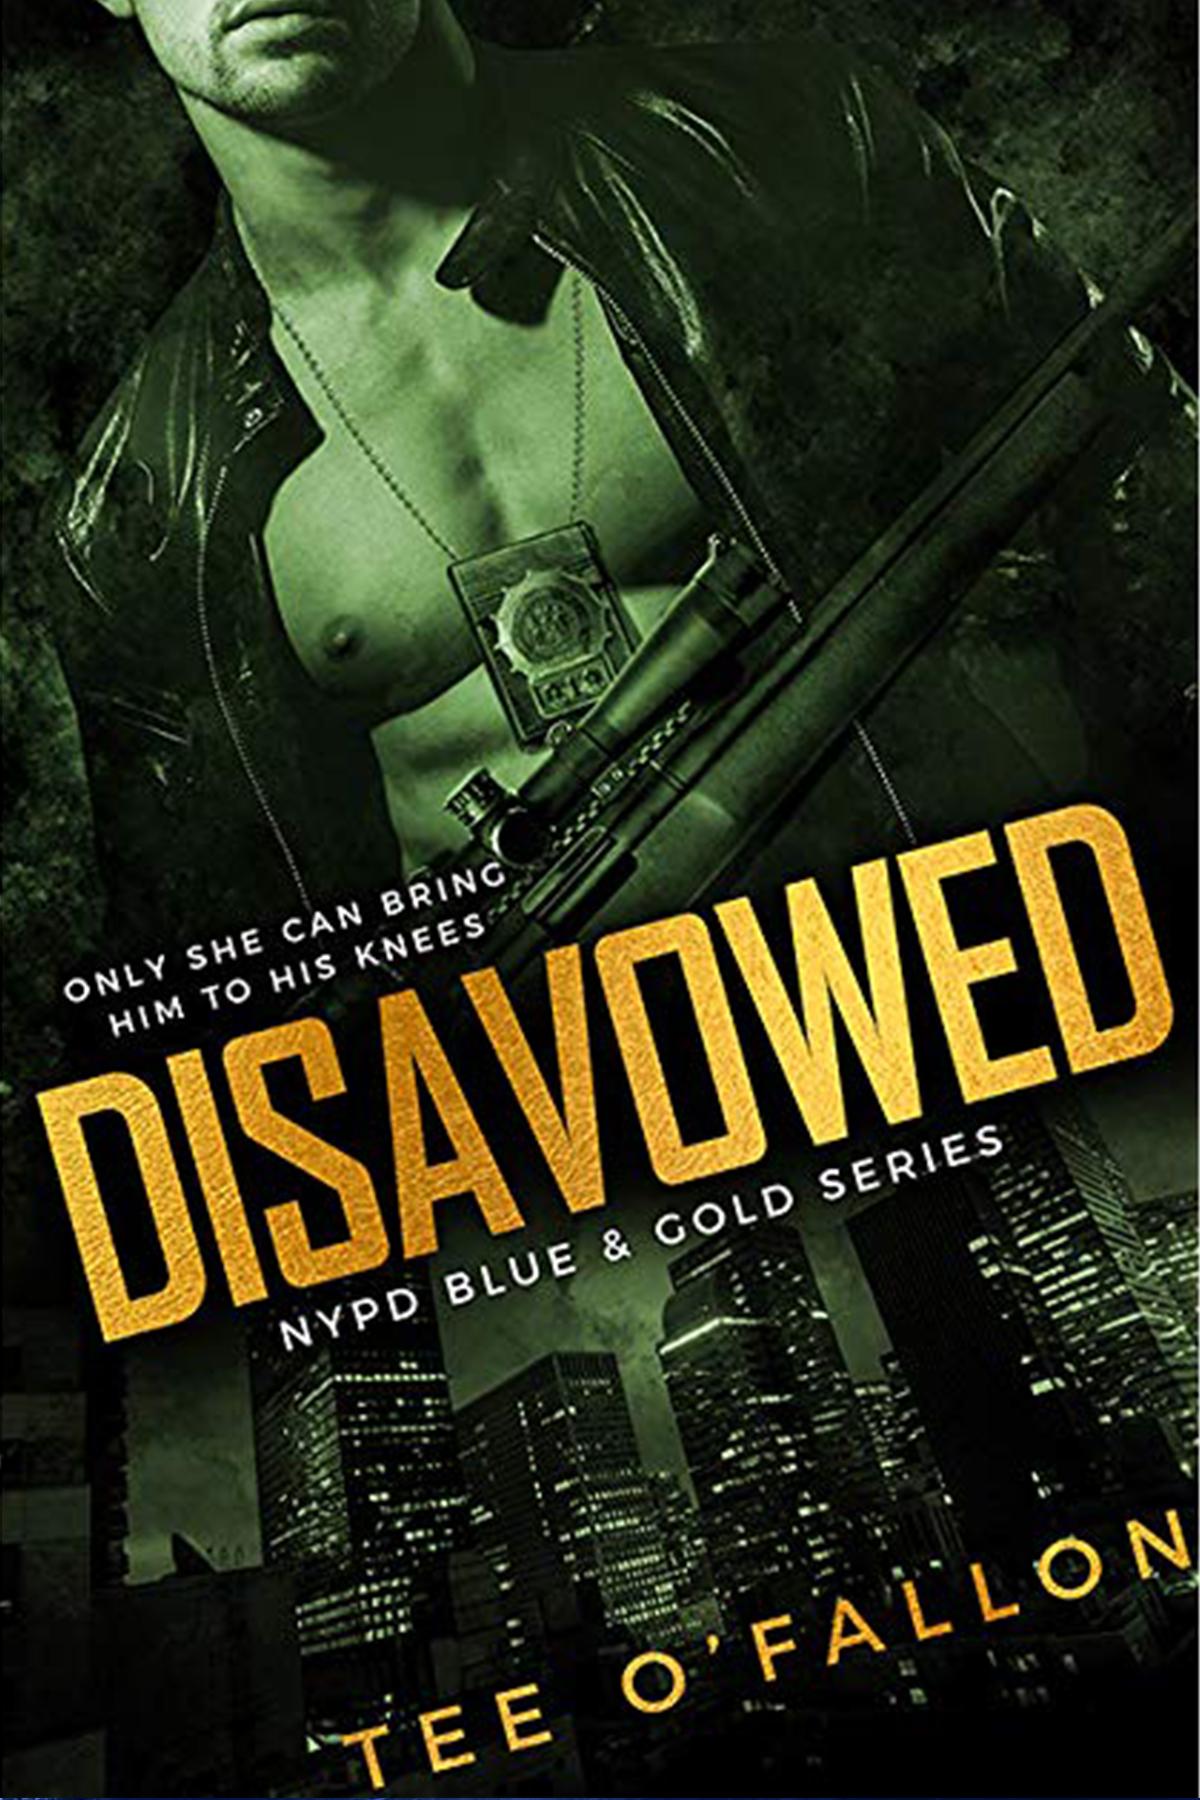 Disavowed